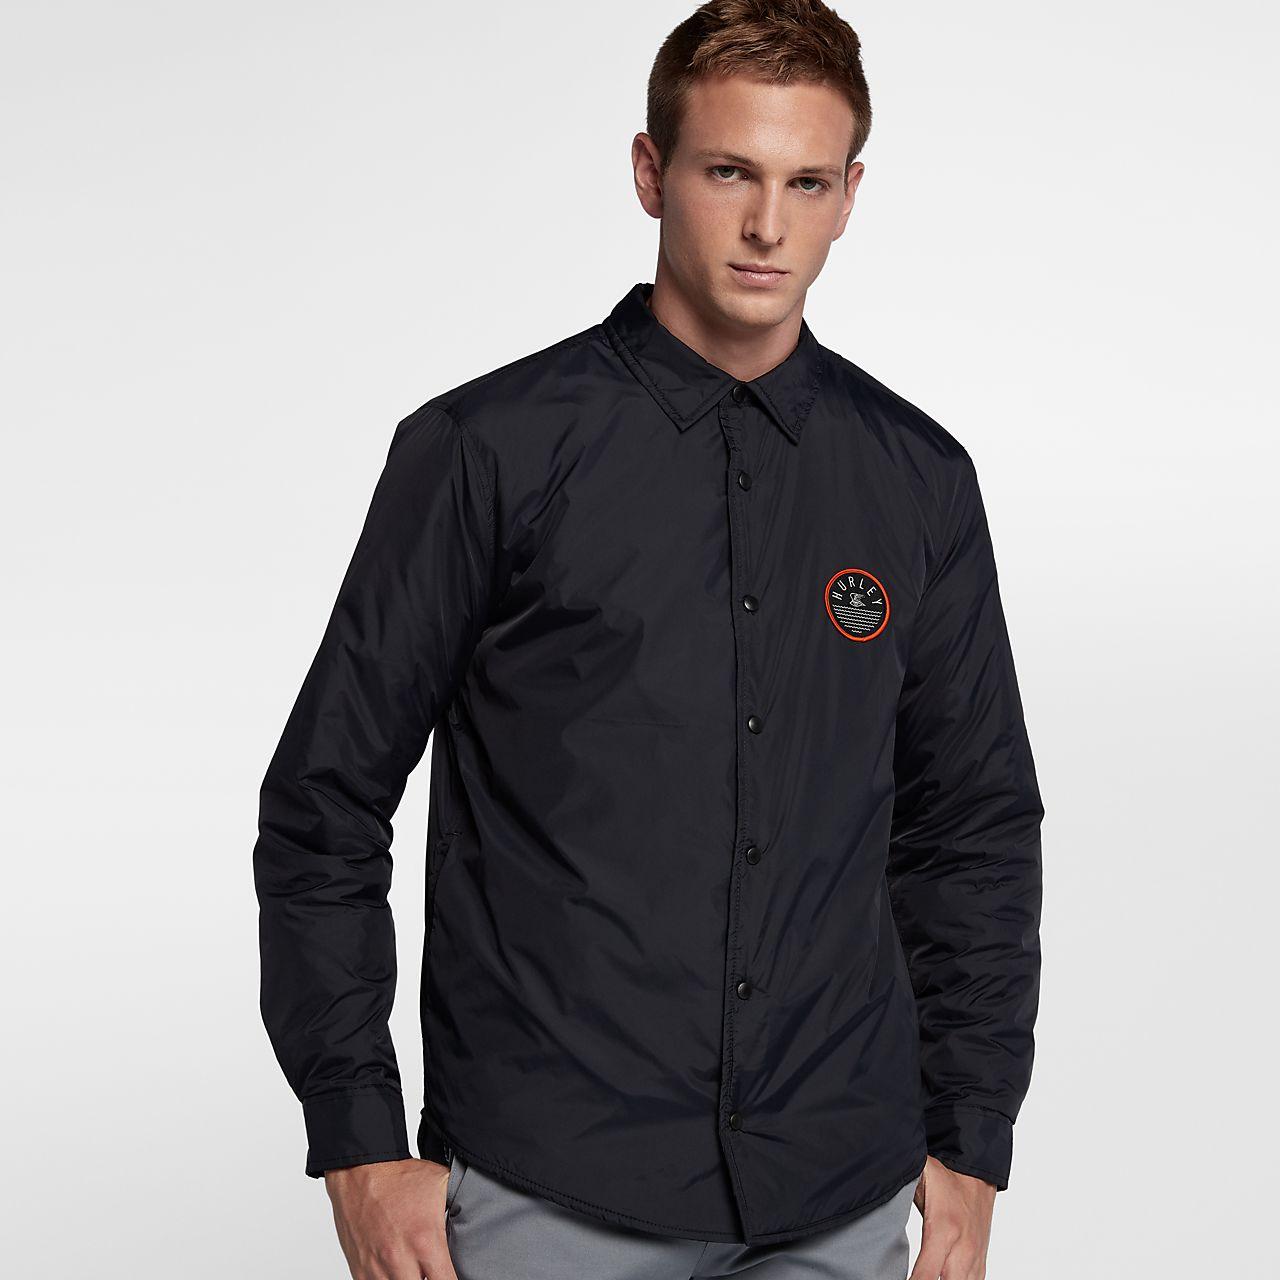 nike jackets mens jdress jacket